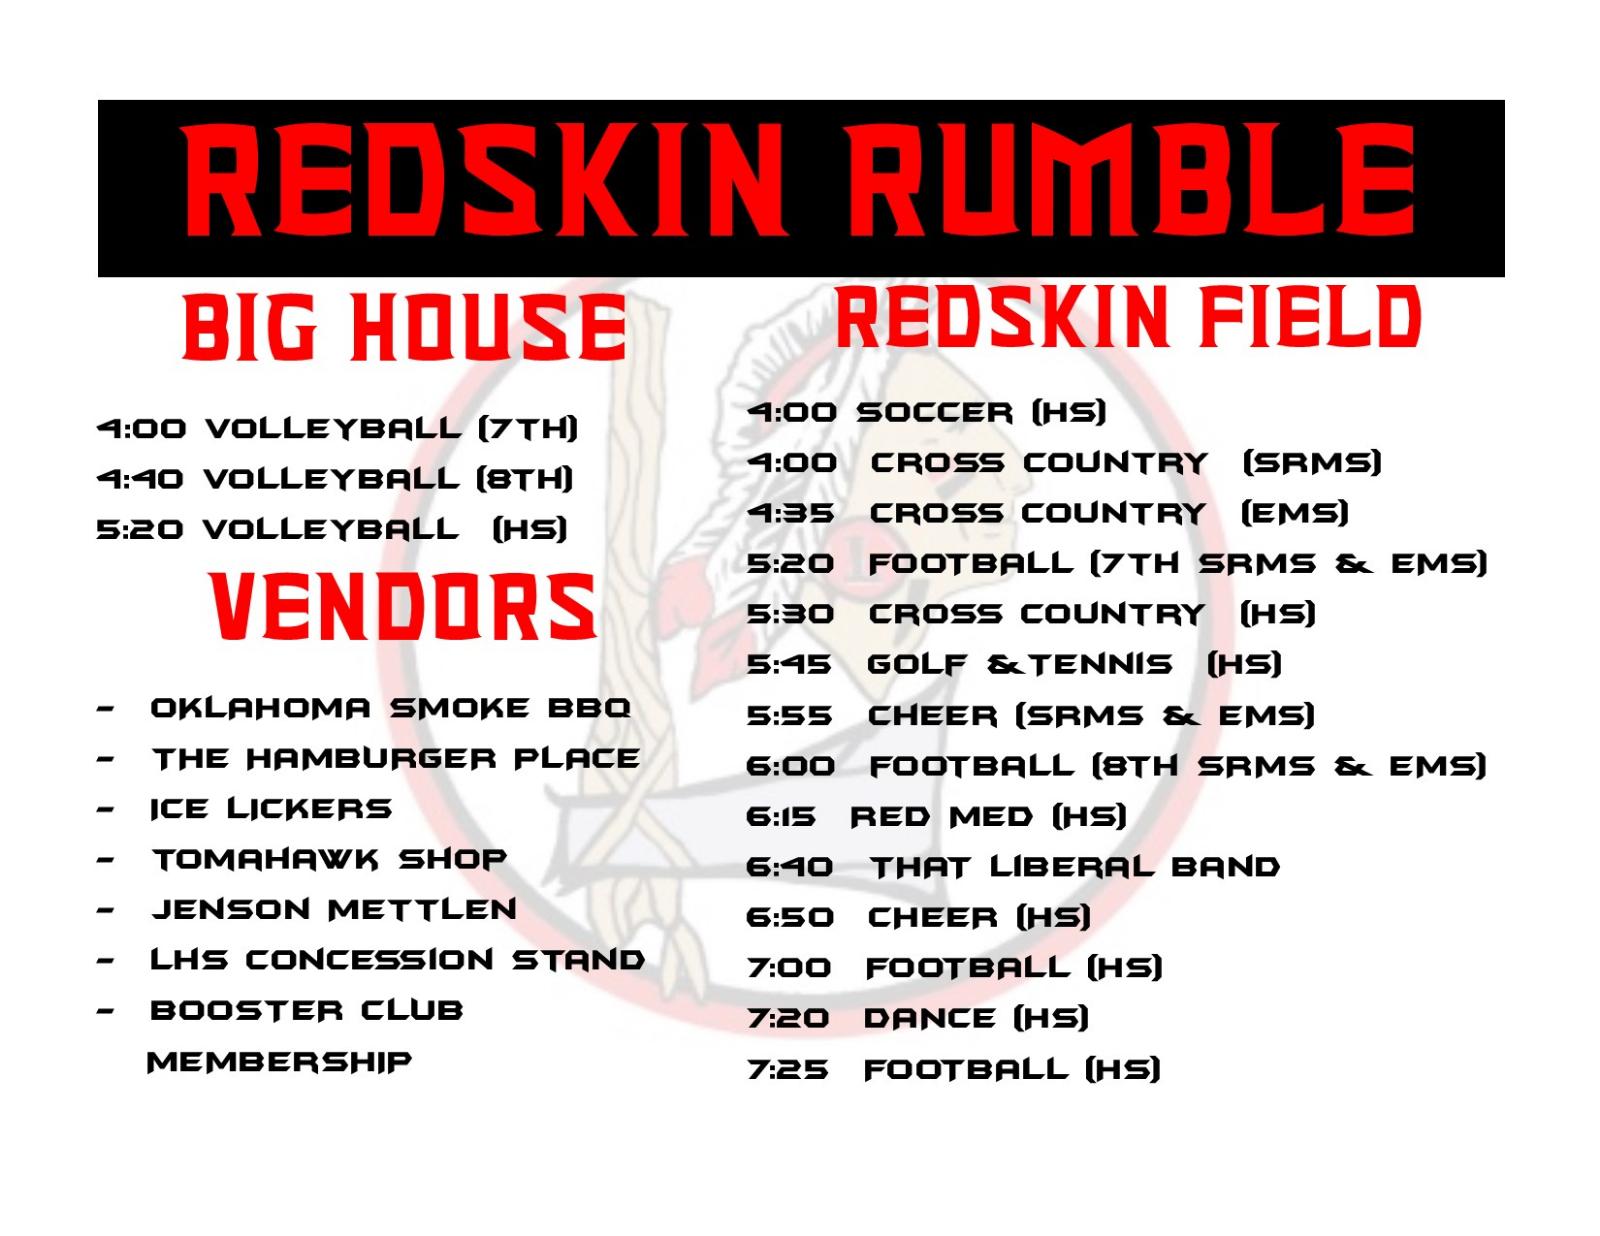 Redskin Rumble 8/29